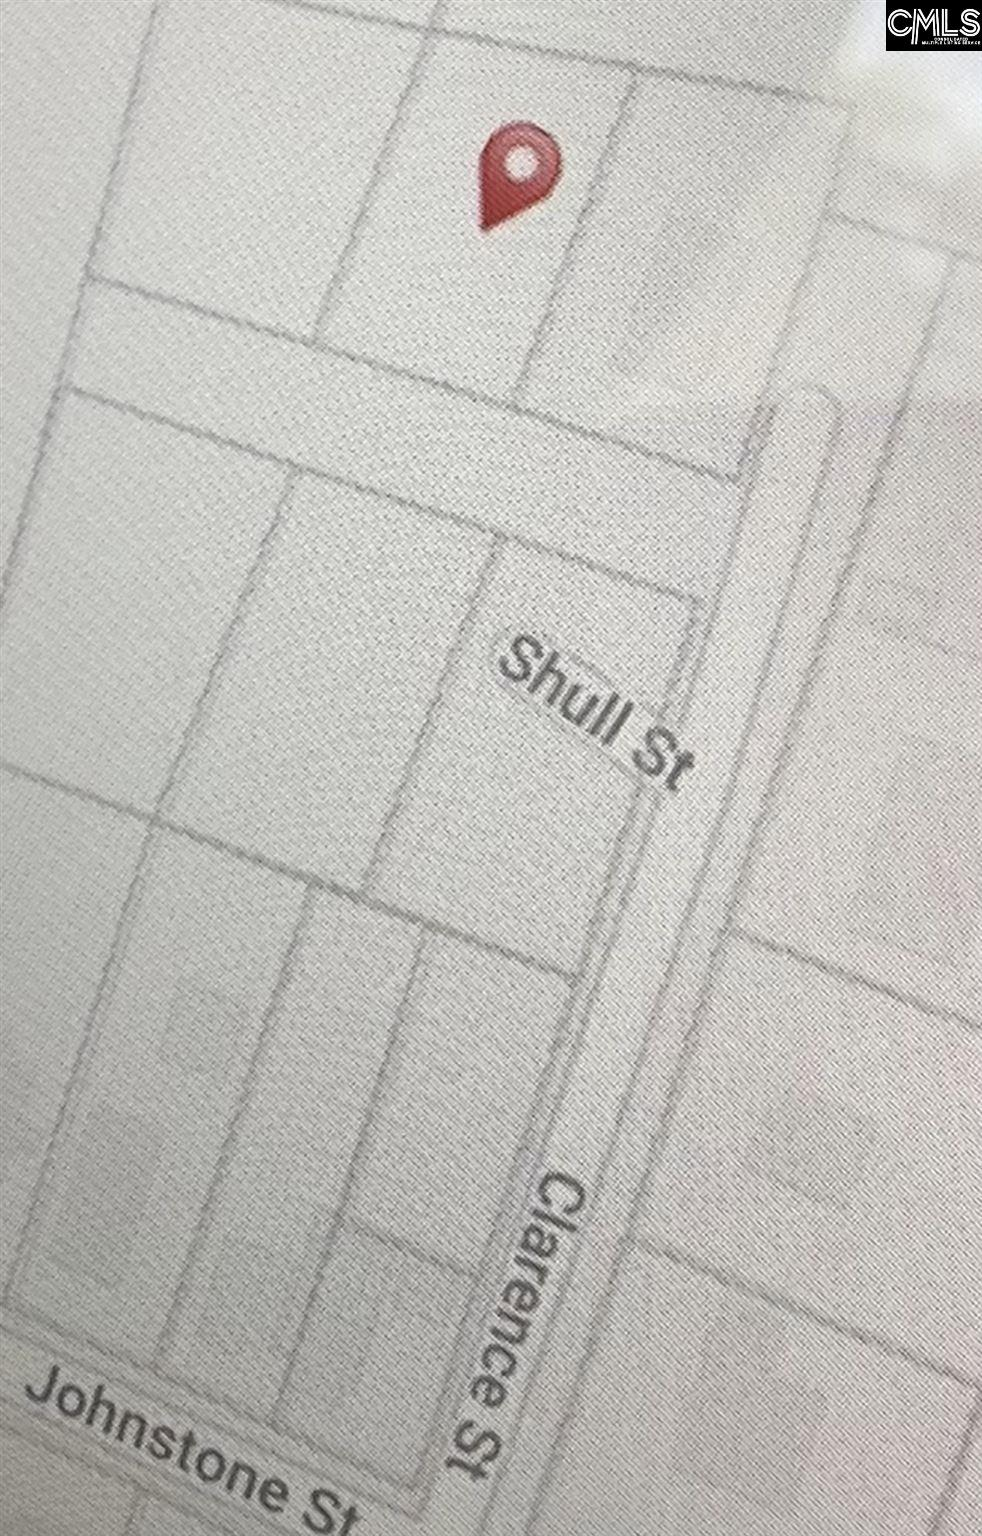 Shull Newberry, SC 29108